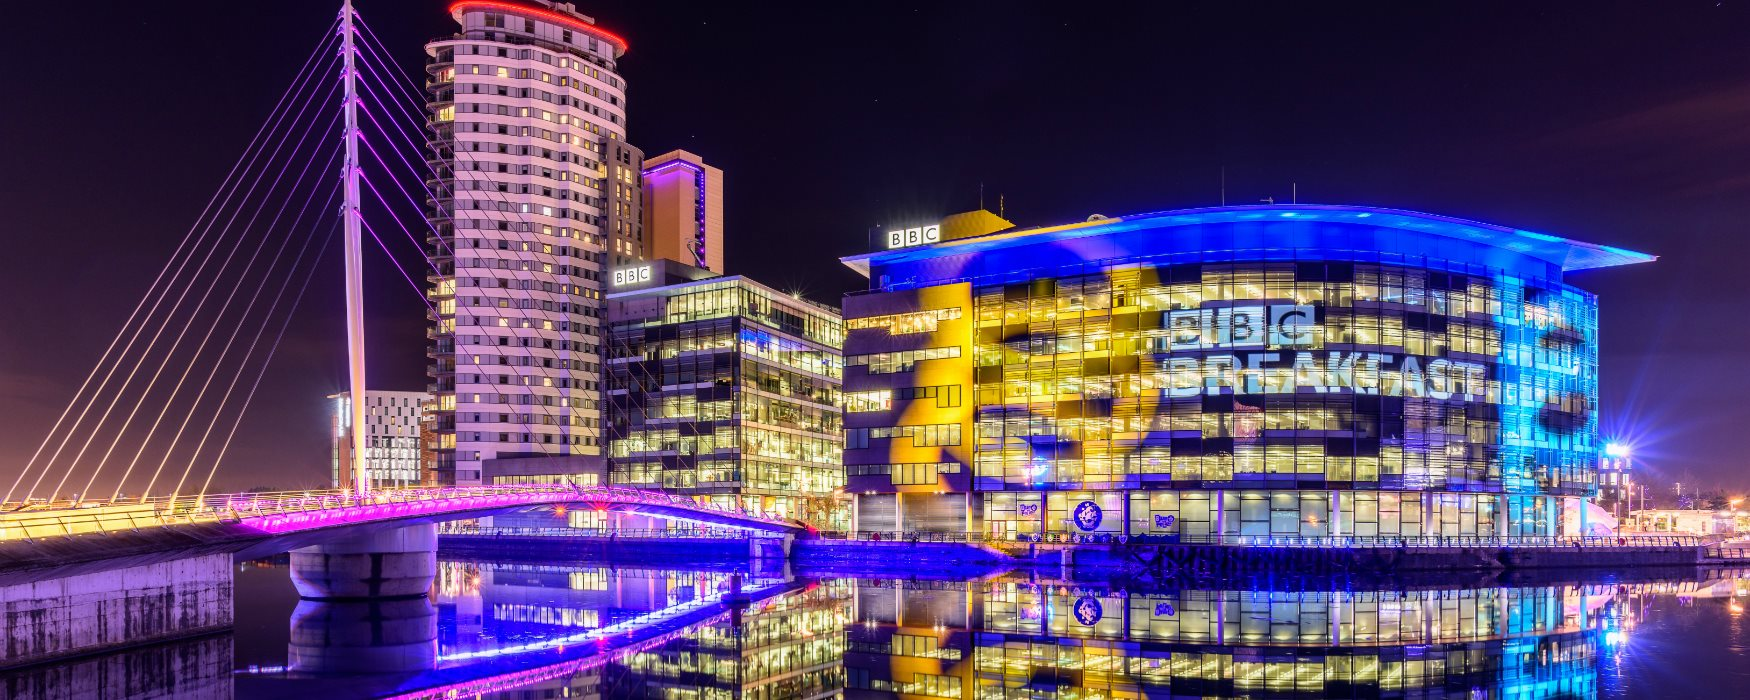 Manchester travel guide 2019: shops, restaurants, arts.